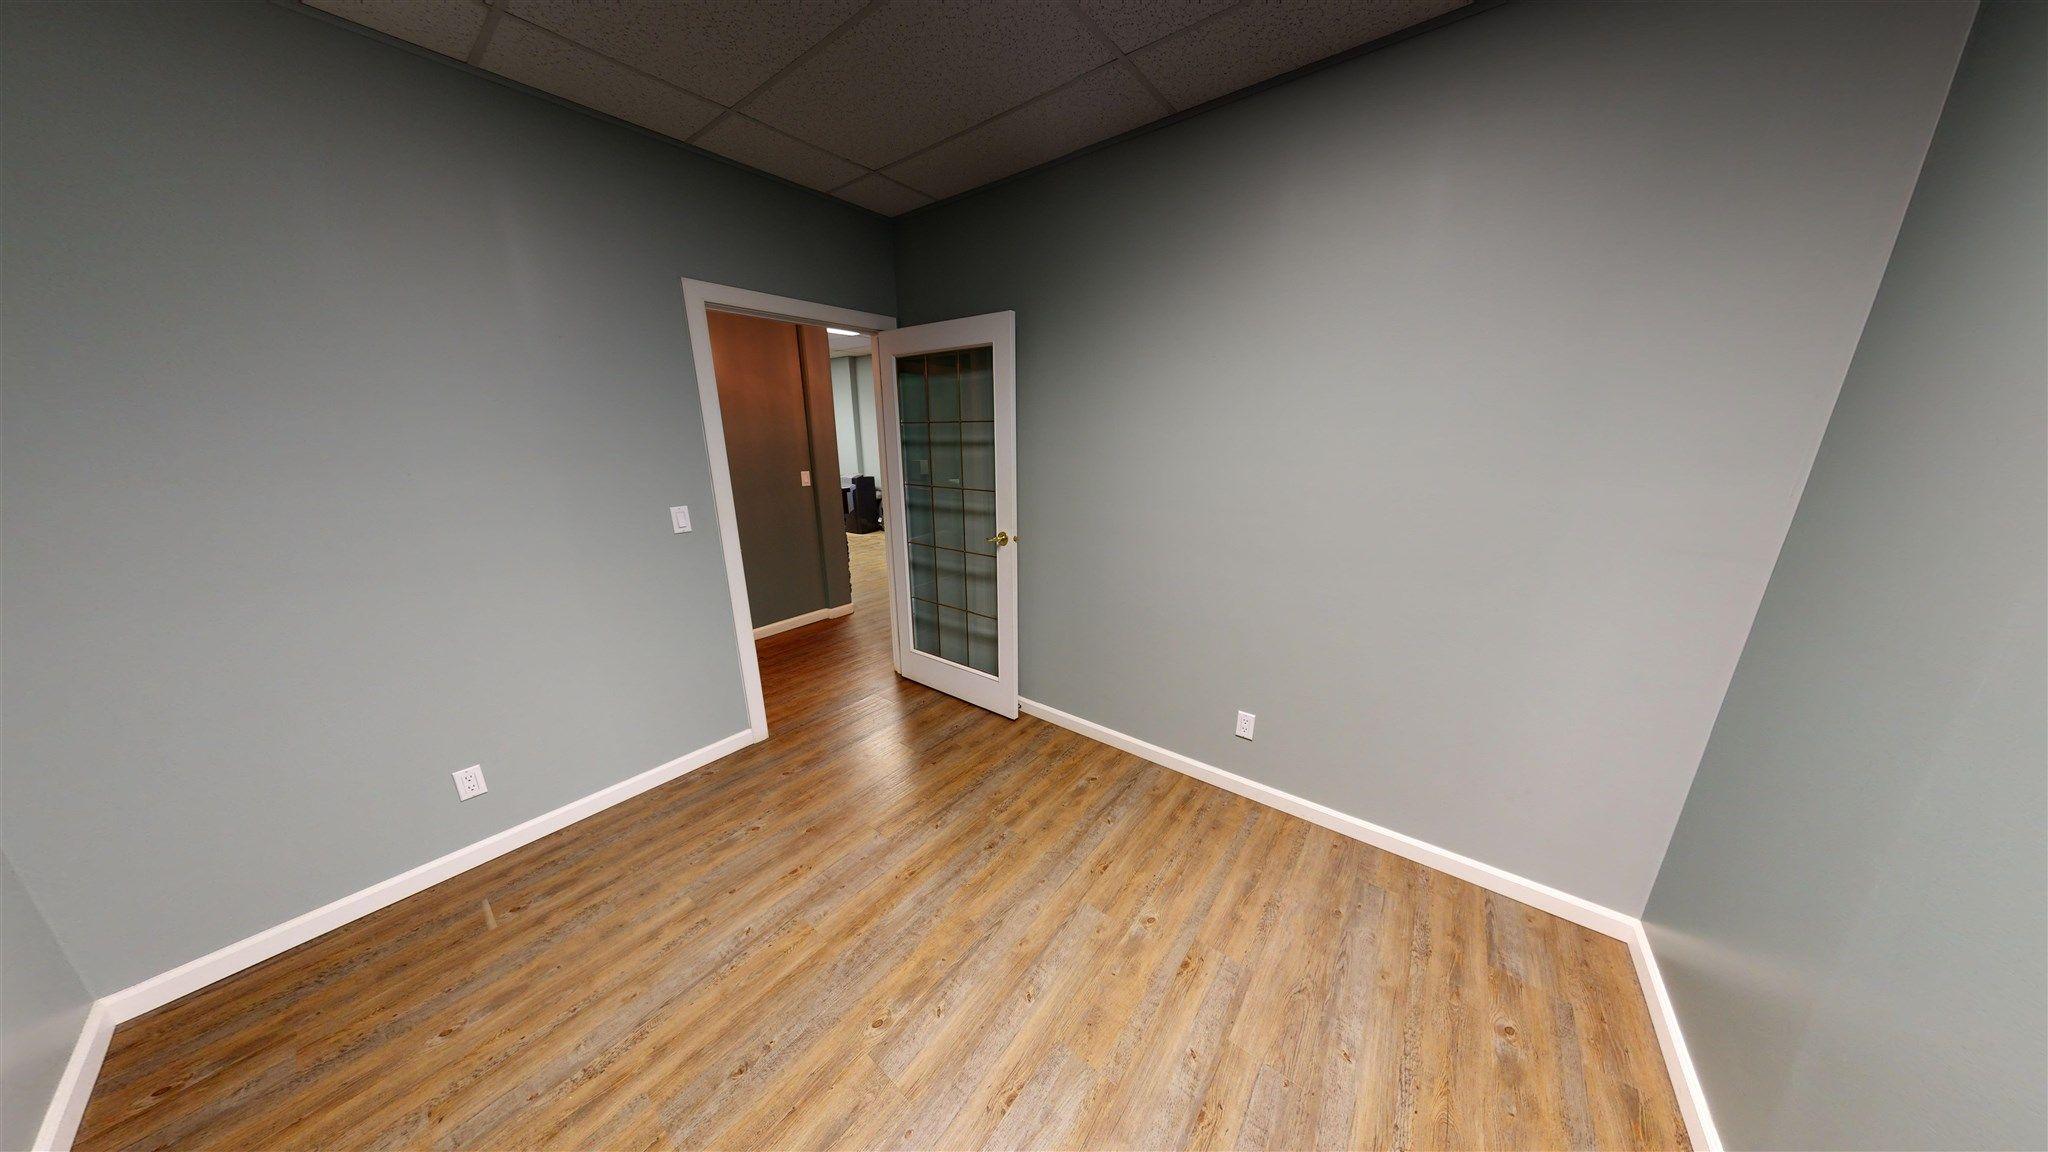 Photo 19: Photos: 10067 100 Avenue in Fort St. John: Fort St. John - City NW Office for sale (Fort St. John (Zone 60))  : MLS®# C8039097